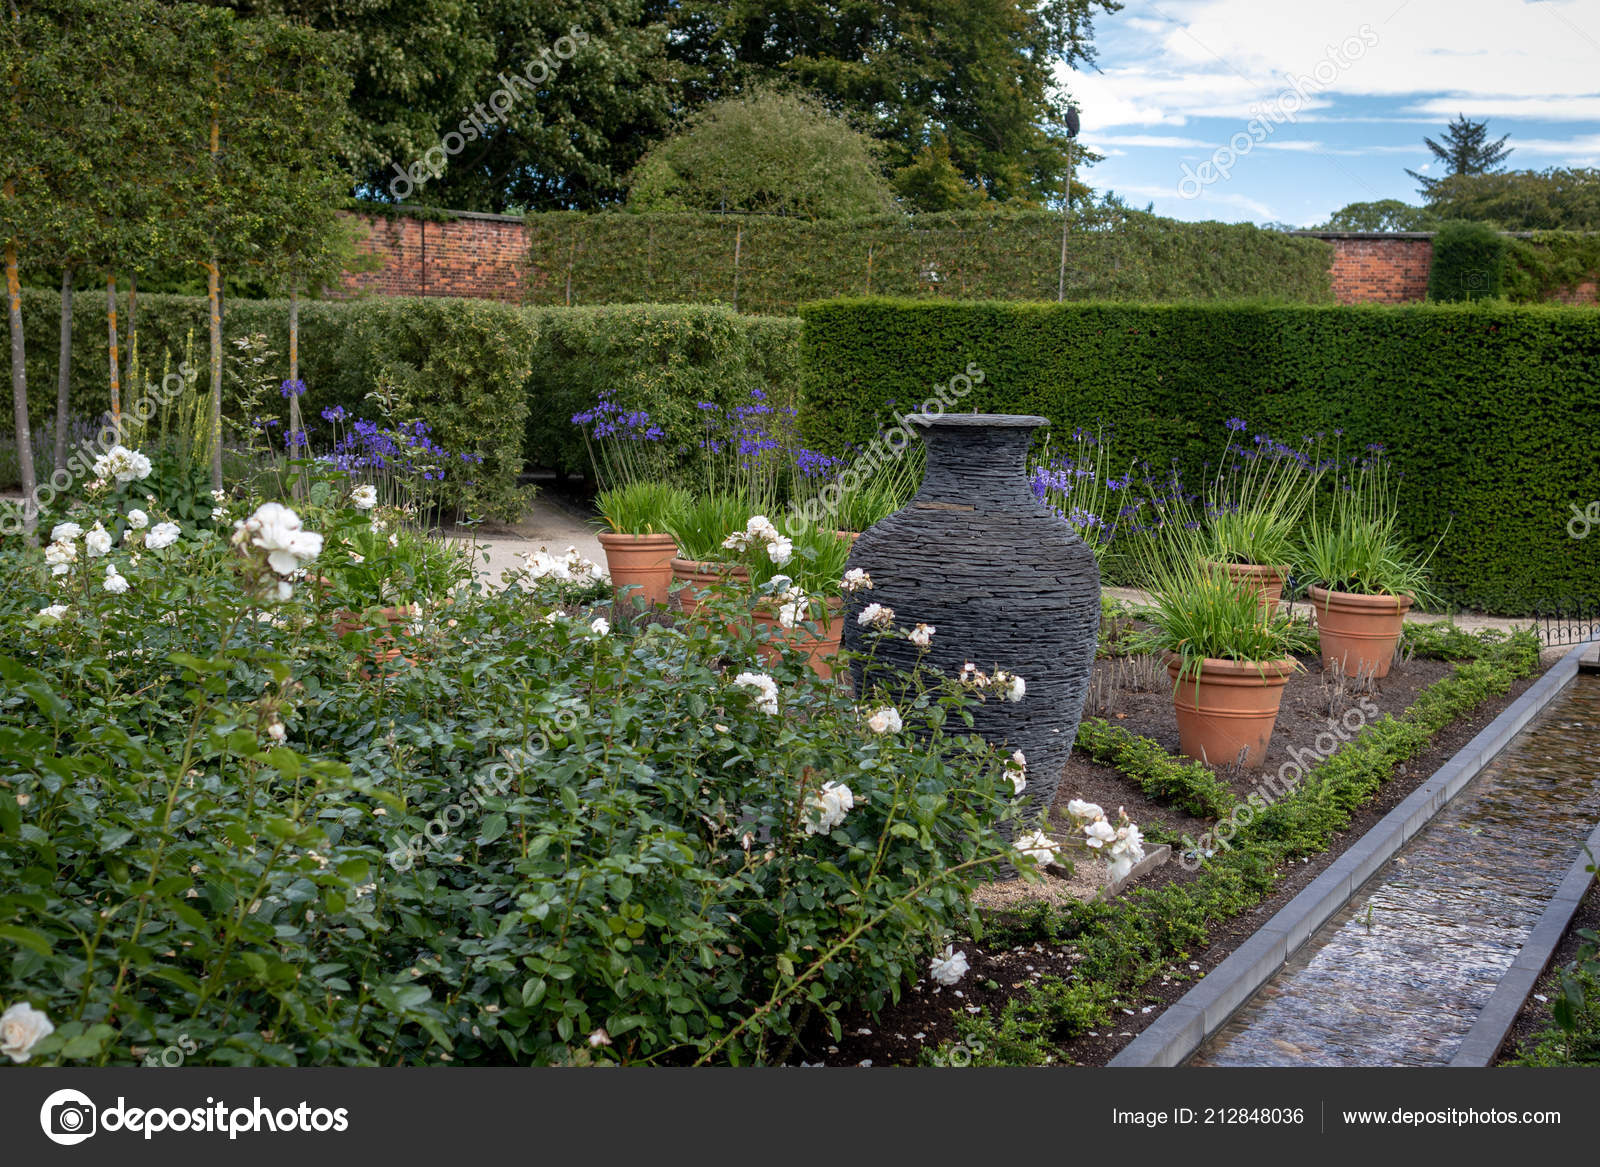 Alnwick Northumberland Juillet 2018 Jardin Ornement Dans Les ...